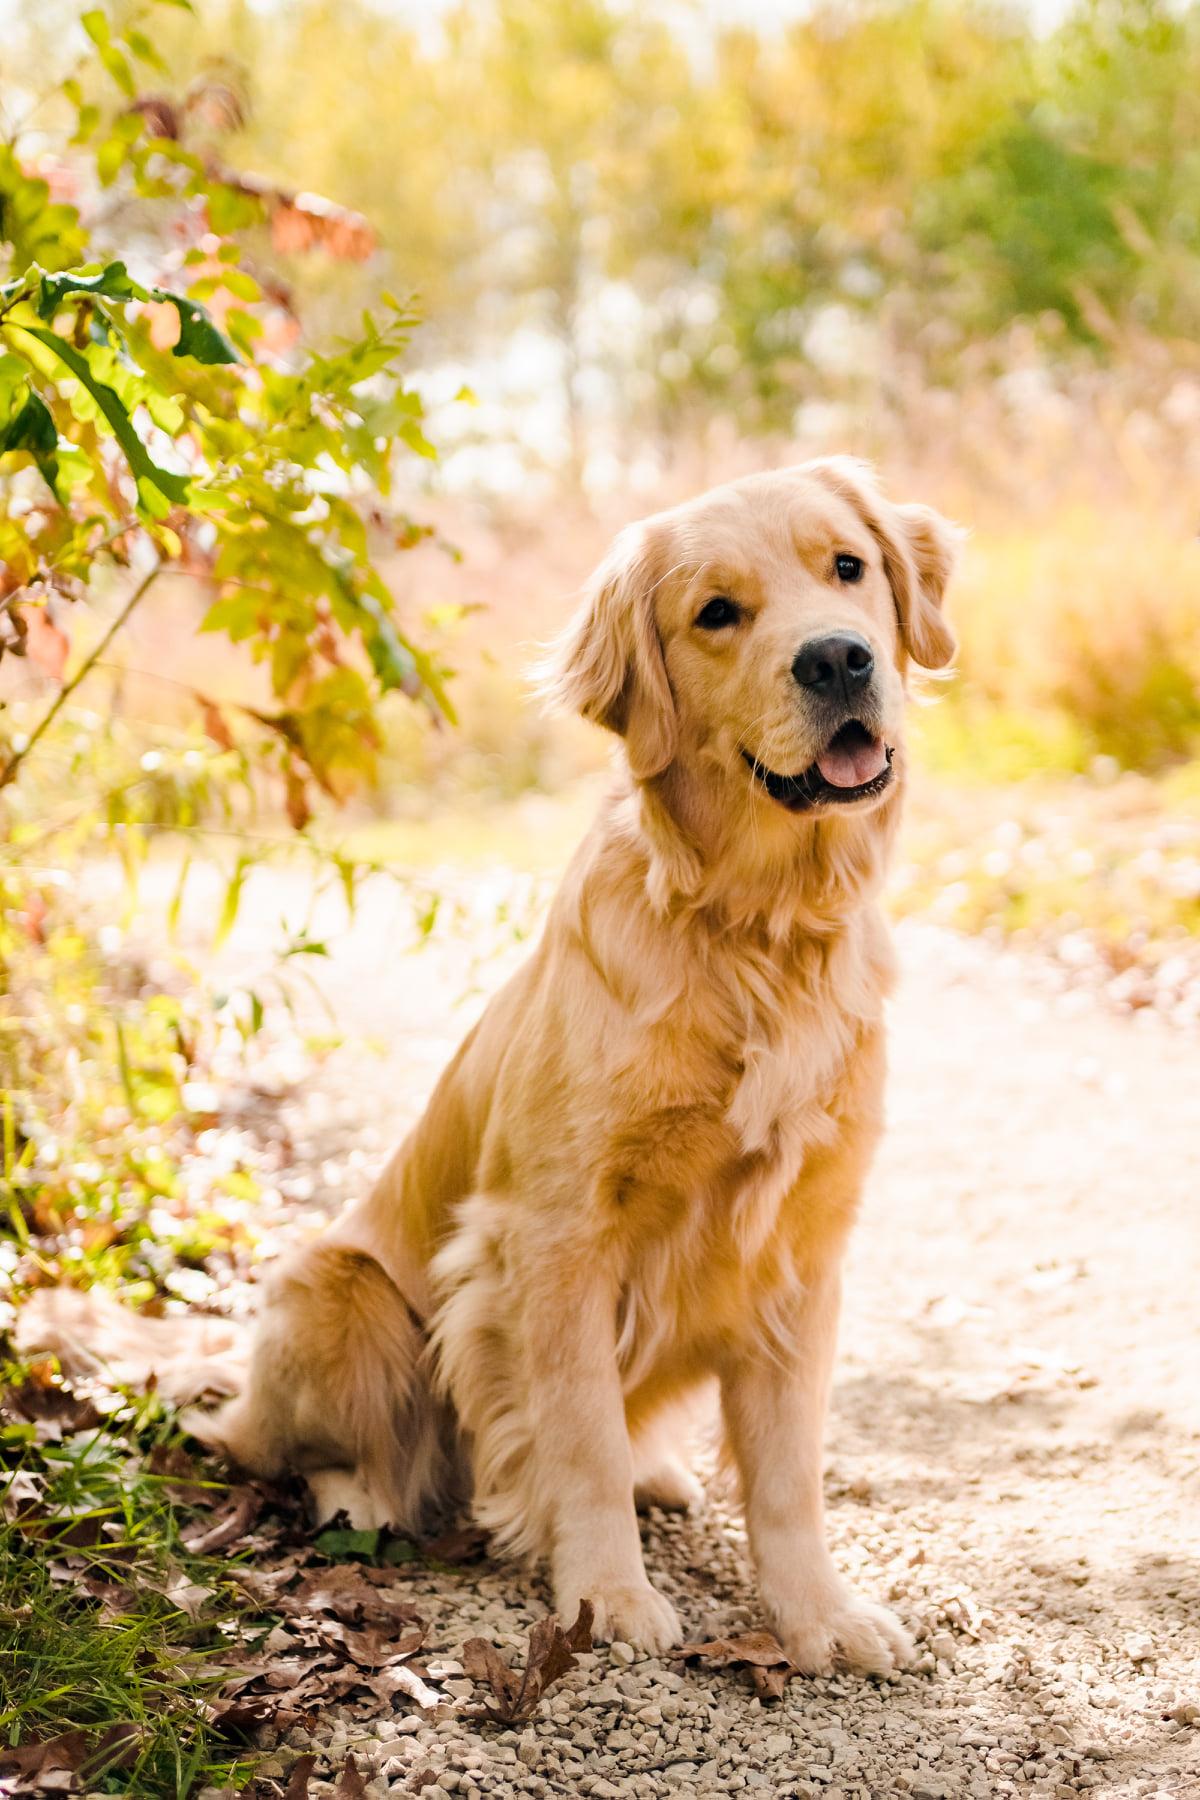 Kona DOTM in Apple Valley Dog Day Getaway